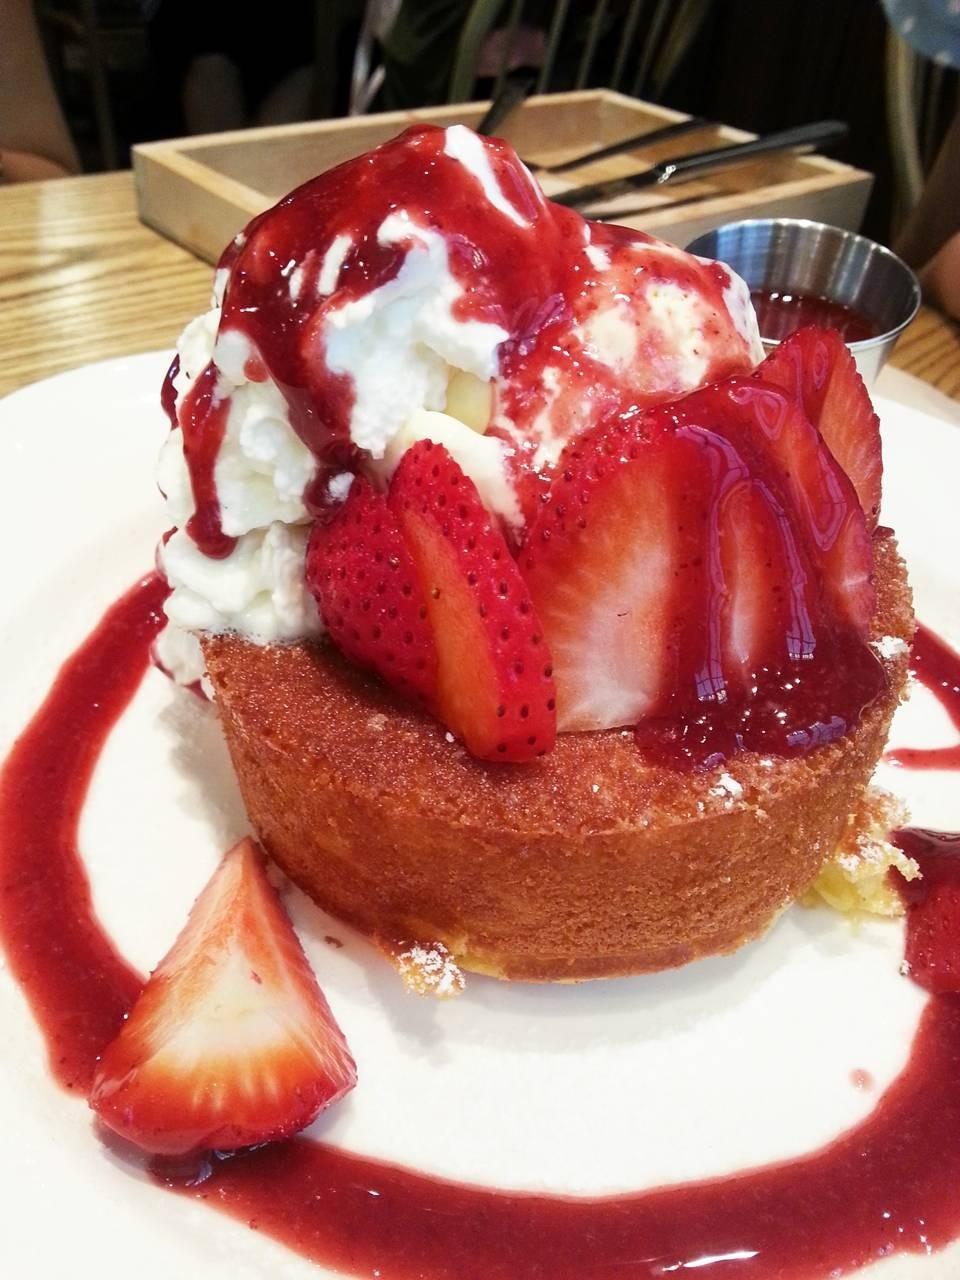 Strawberry Pancake soufflé (185 บาท) ชอบเมนูนี้สุดในบรรดา pancake souffle เลยค่ะ